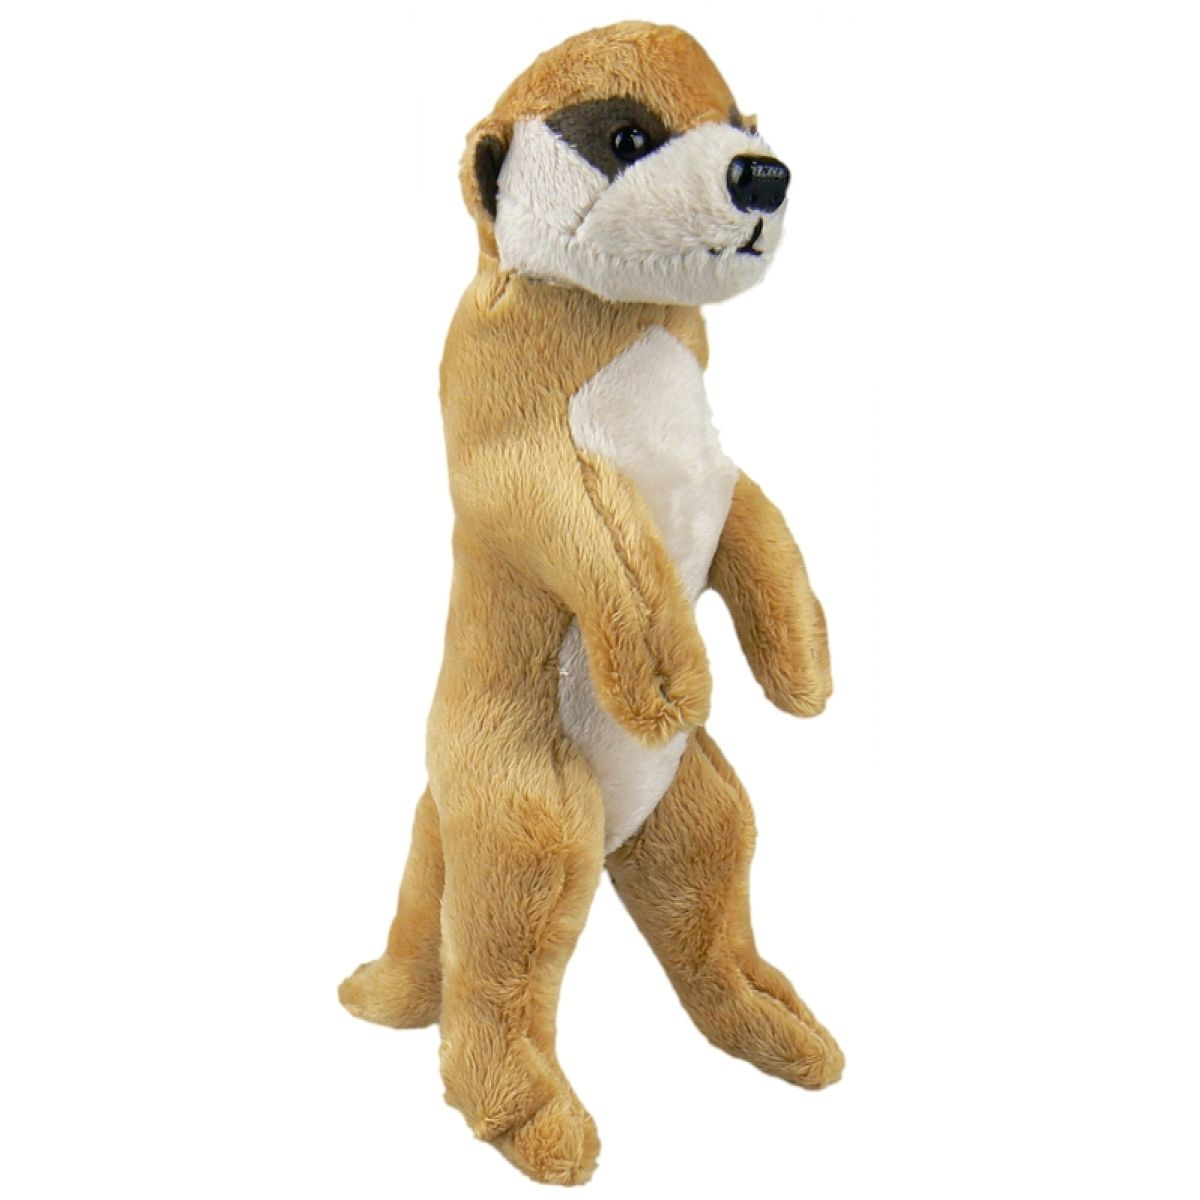 Plyšová surikata 21cm